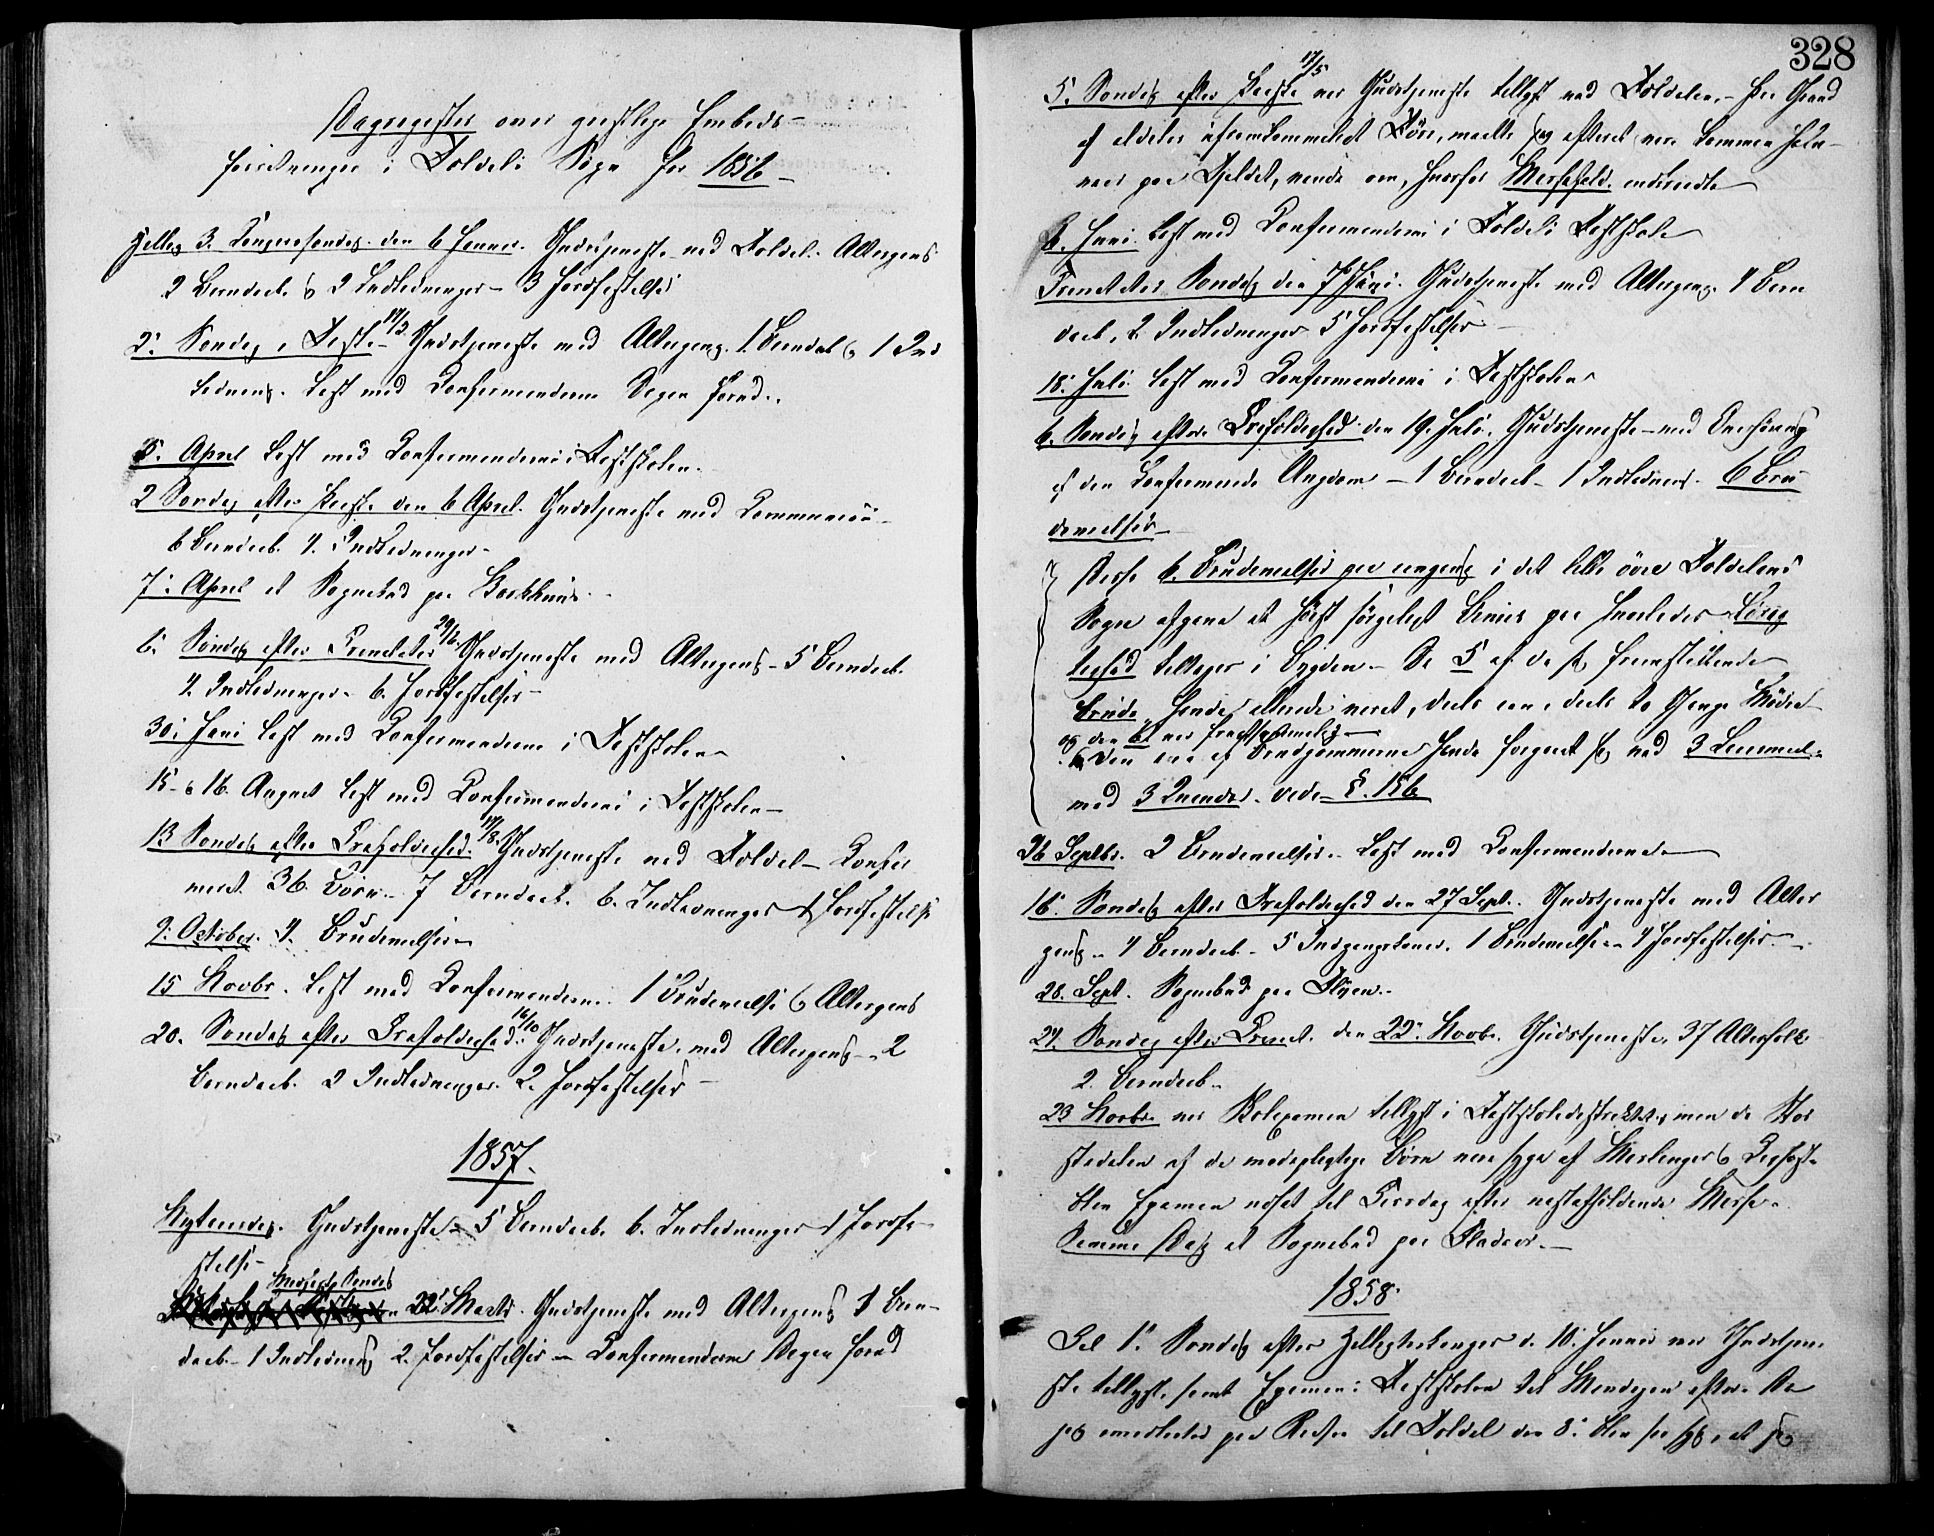 SAH, Lesja prestekontor, Ministerialbok nr. 7, 1854-1862, s. 328